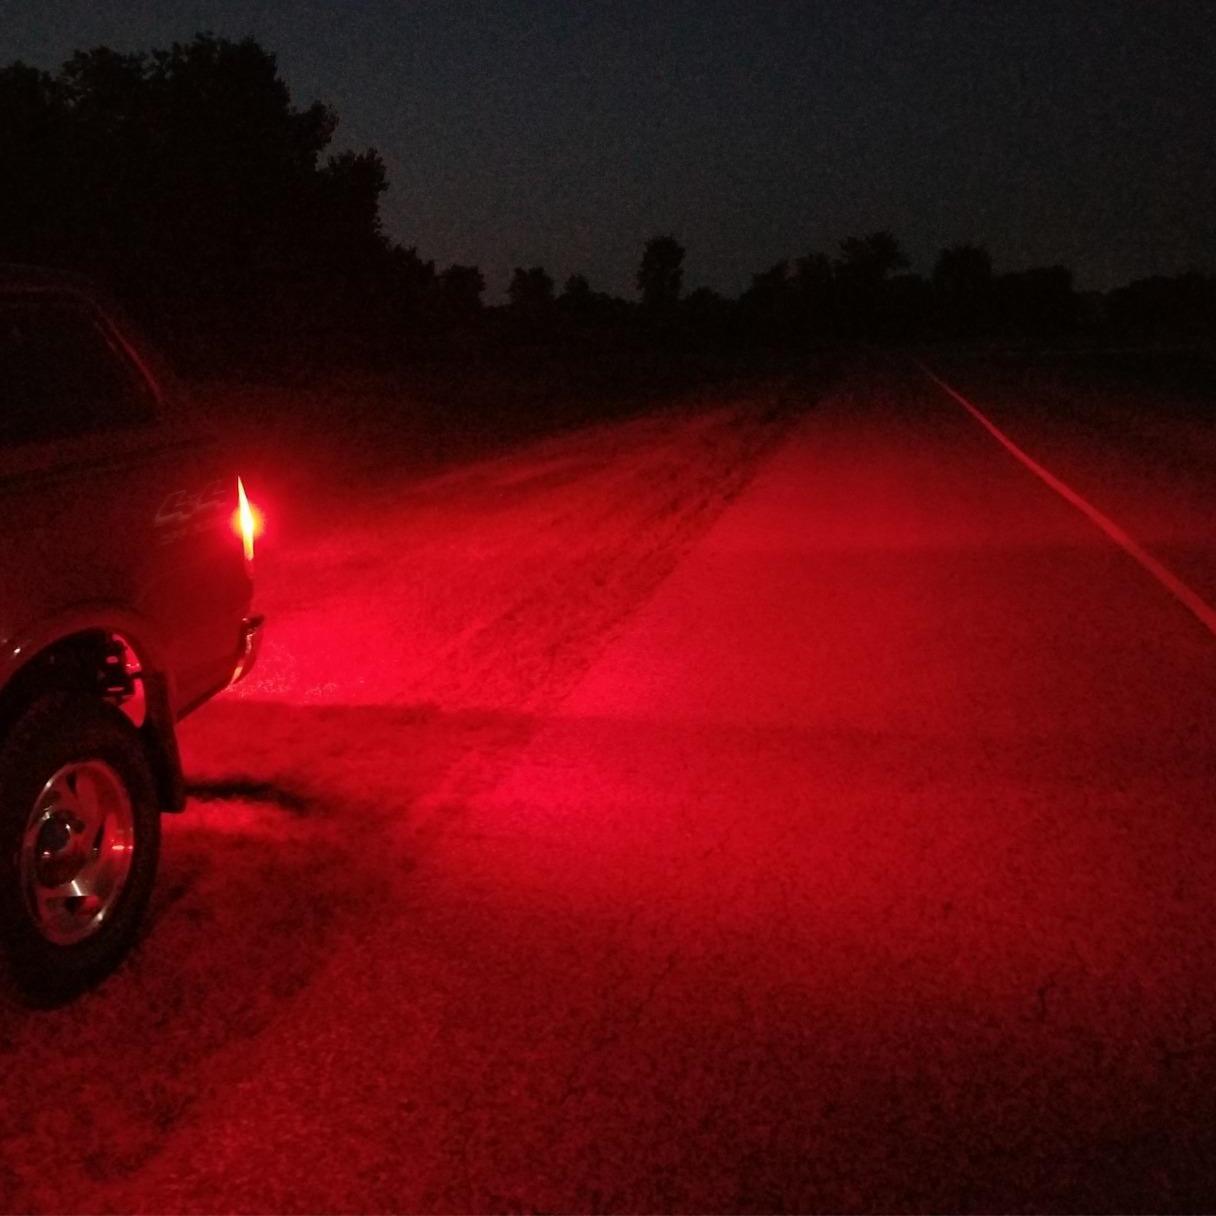 T20-7440-7443-LED-bulb-red-tail-brake-signal-lights-7444-7443ll-7440ll